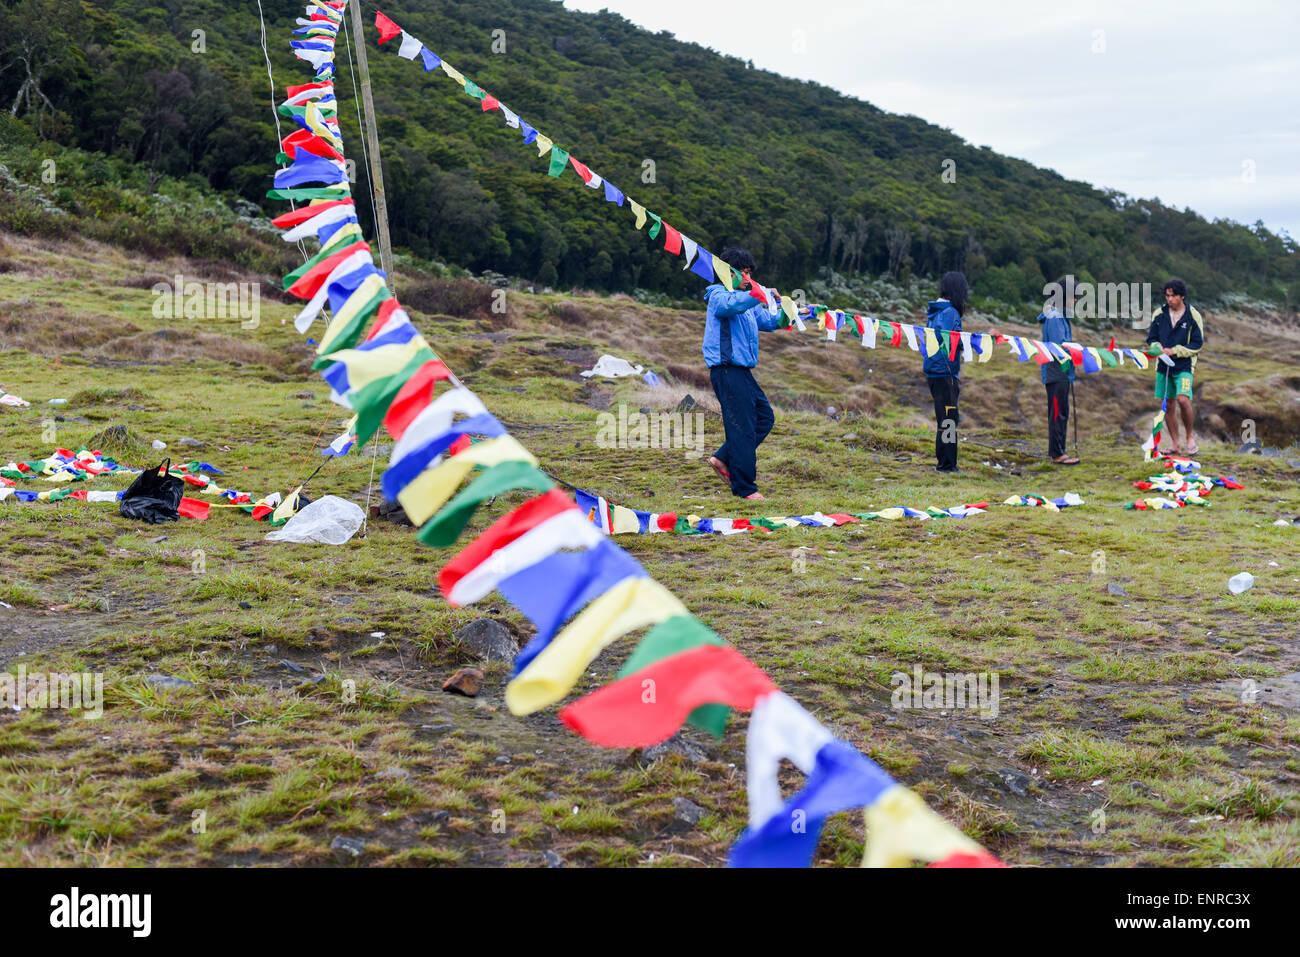 Young men install lung ta prayer flags of Nepal at Suryakencana valley, Mount Gede, Gede Pangrango National Park, - Stock Image